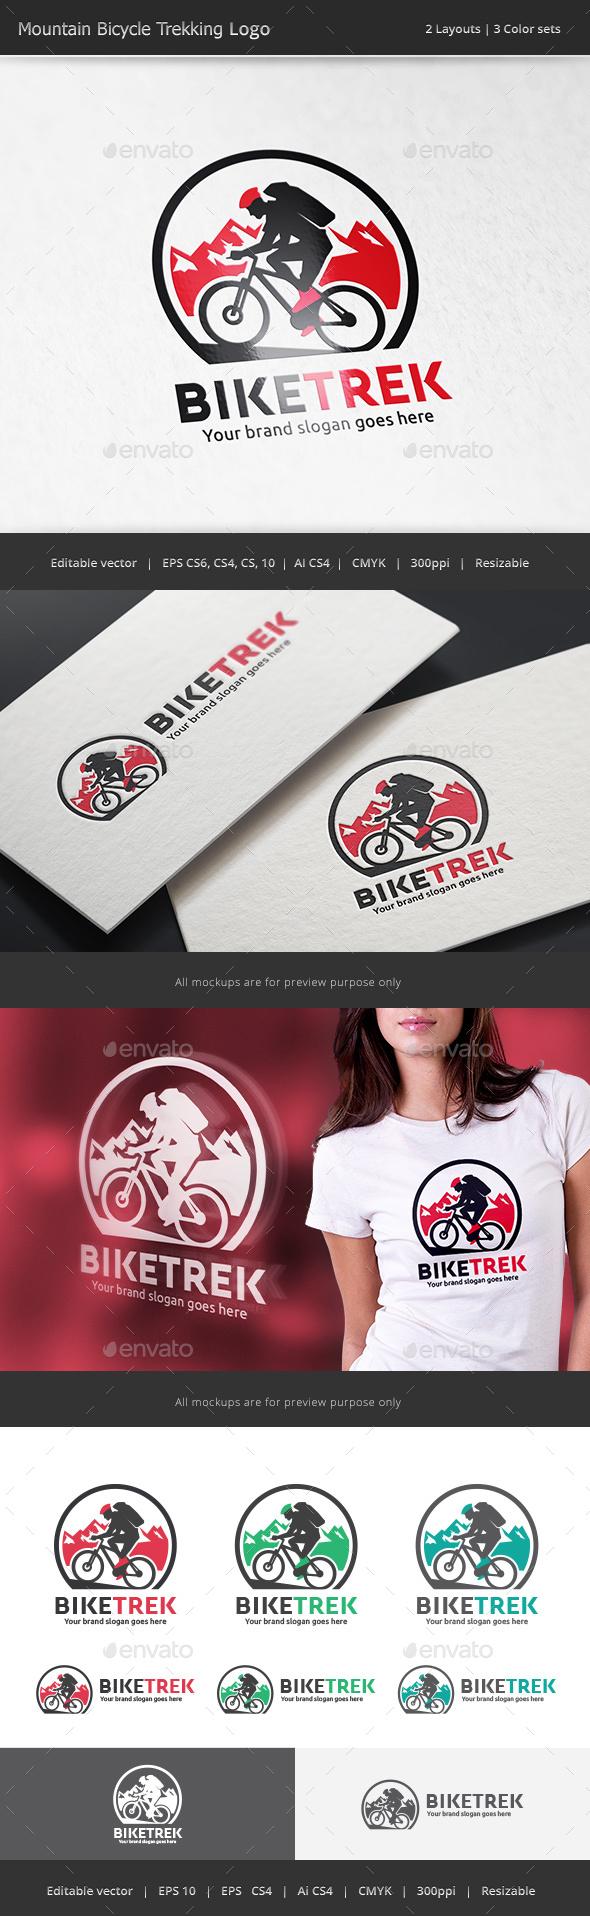 Mountain Bike Trekking Logo